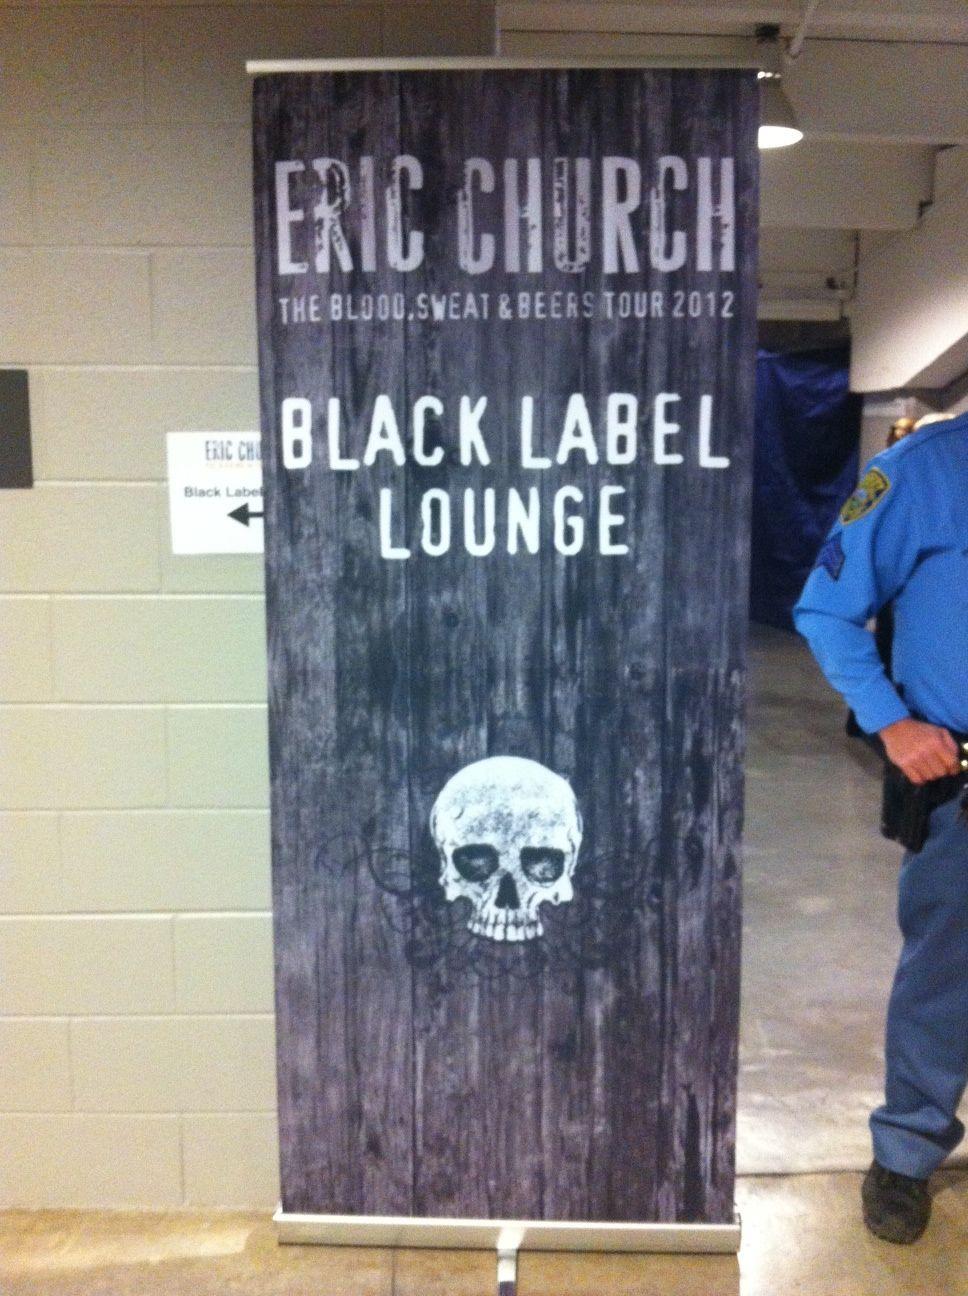 Eric Church 'Black Label Lounge'